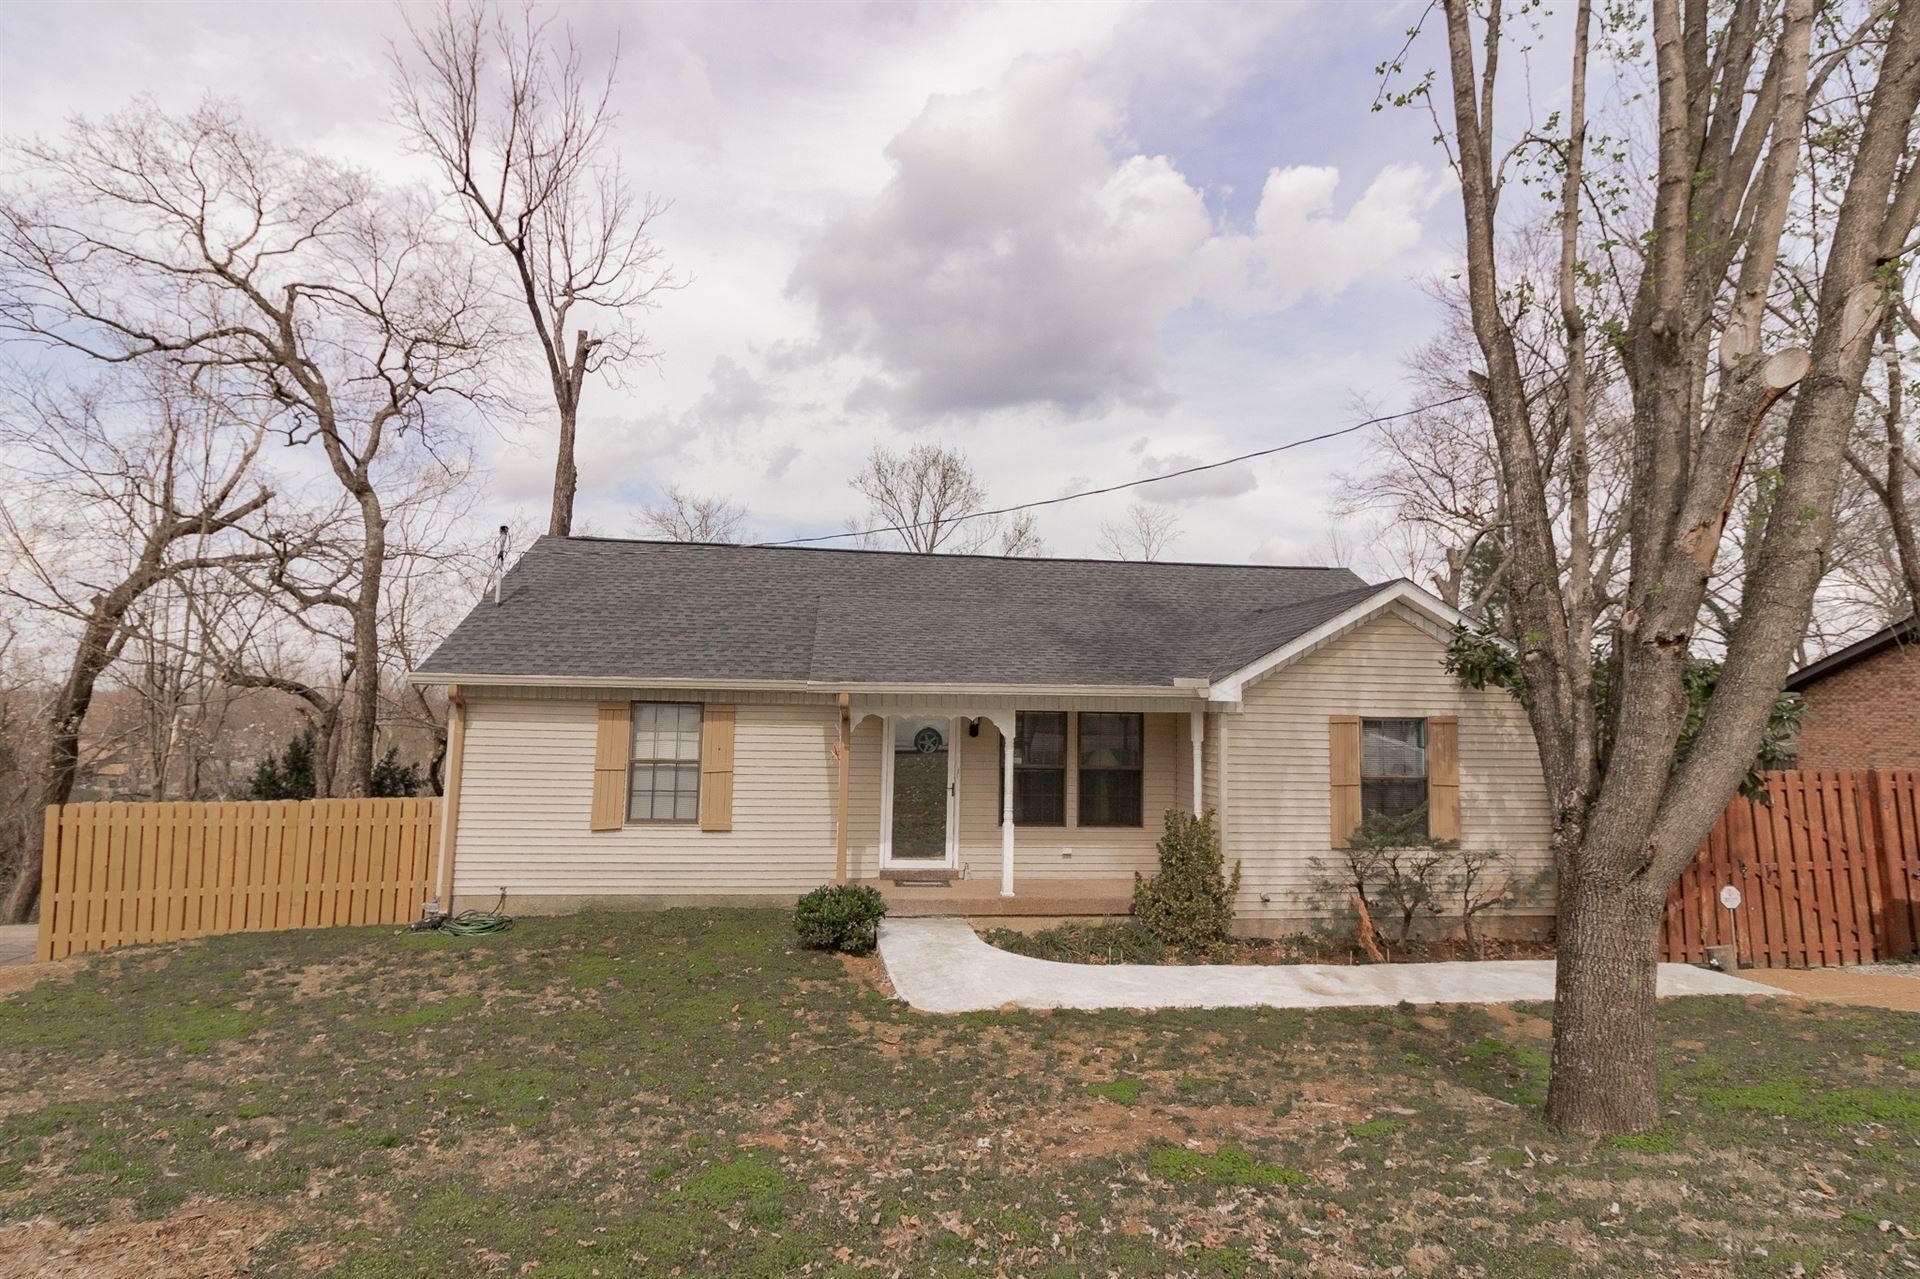 231 Cedarview Dr, Antioch, TN 37013 - MLS#: 2238756